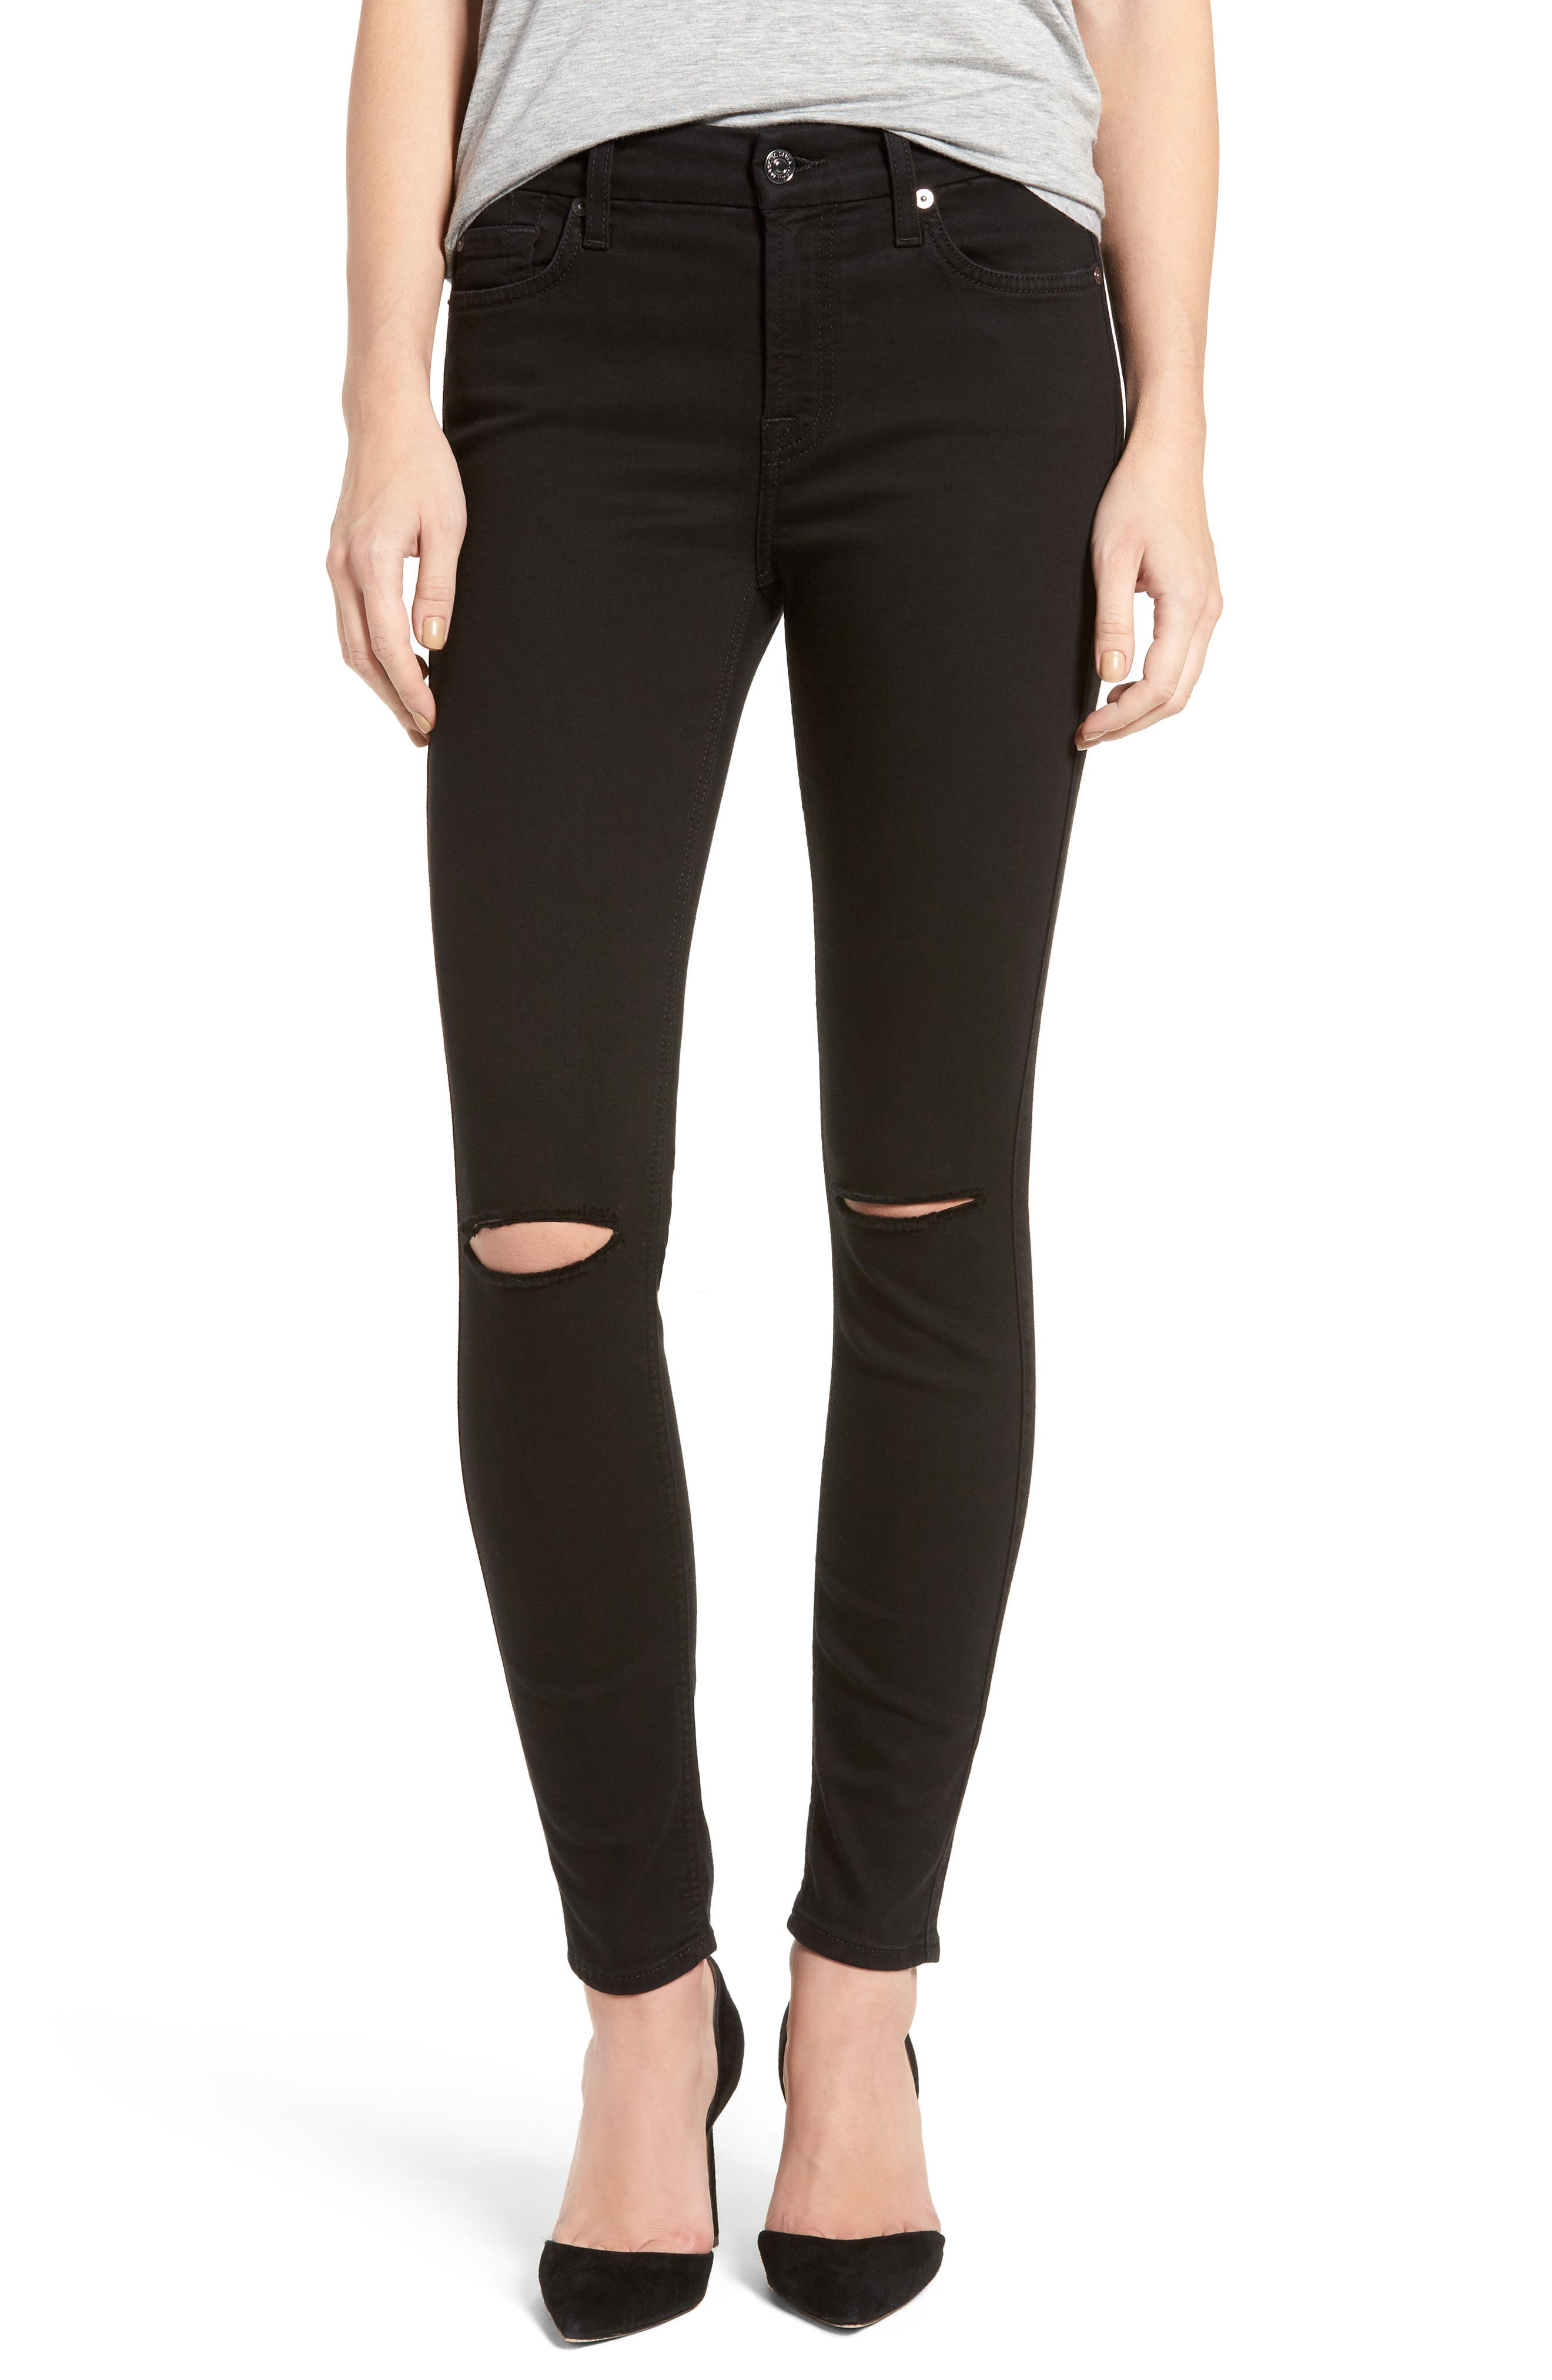 b(air) Ankle Skinny Jeans,                             Main thumbnail 1, color,                             BAIR BLACK 2